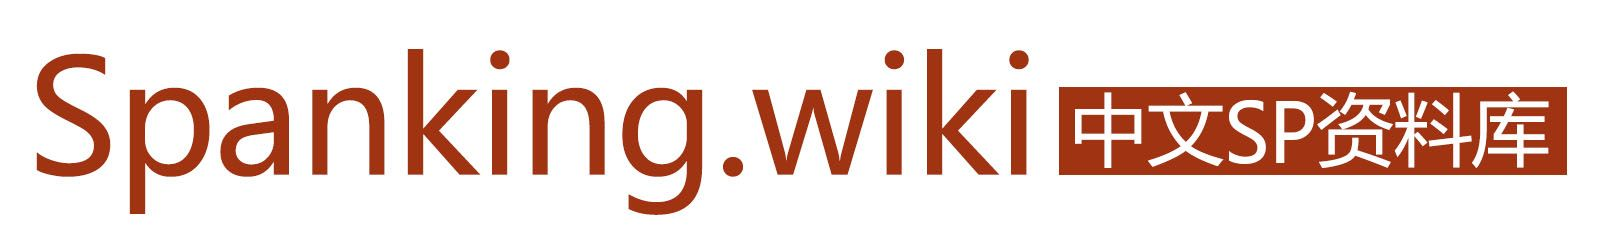 Spanking Wiki – 打屁股 Spank – SP 中文资料库